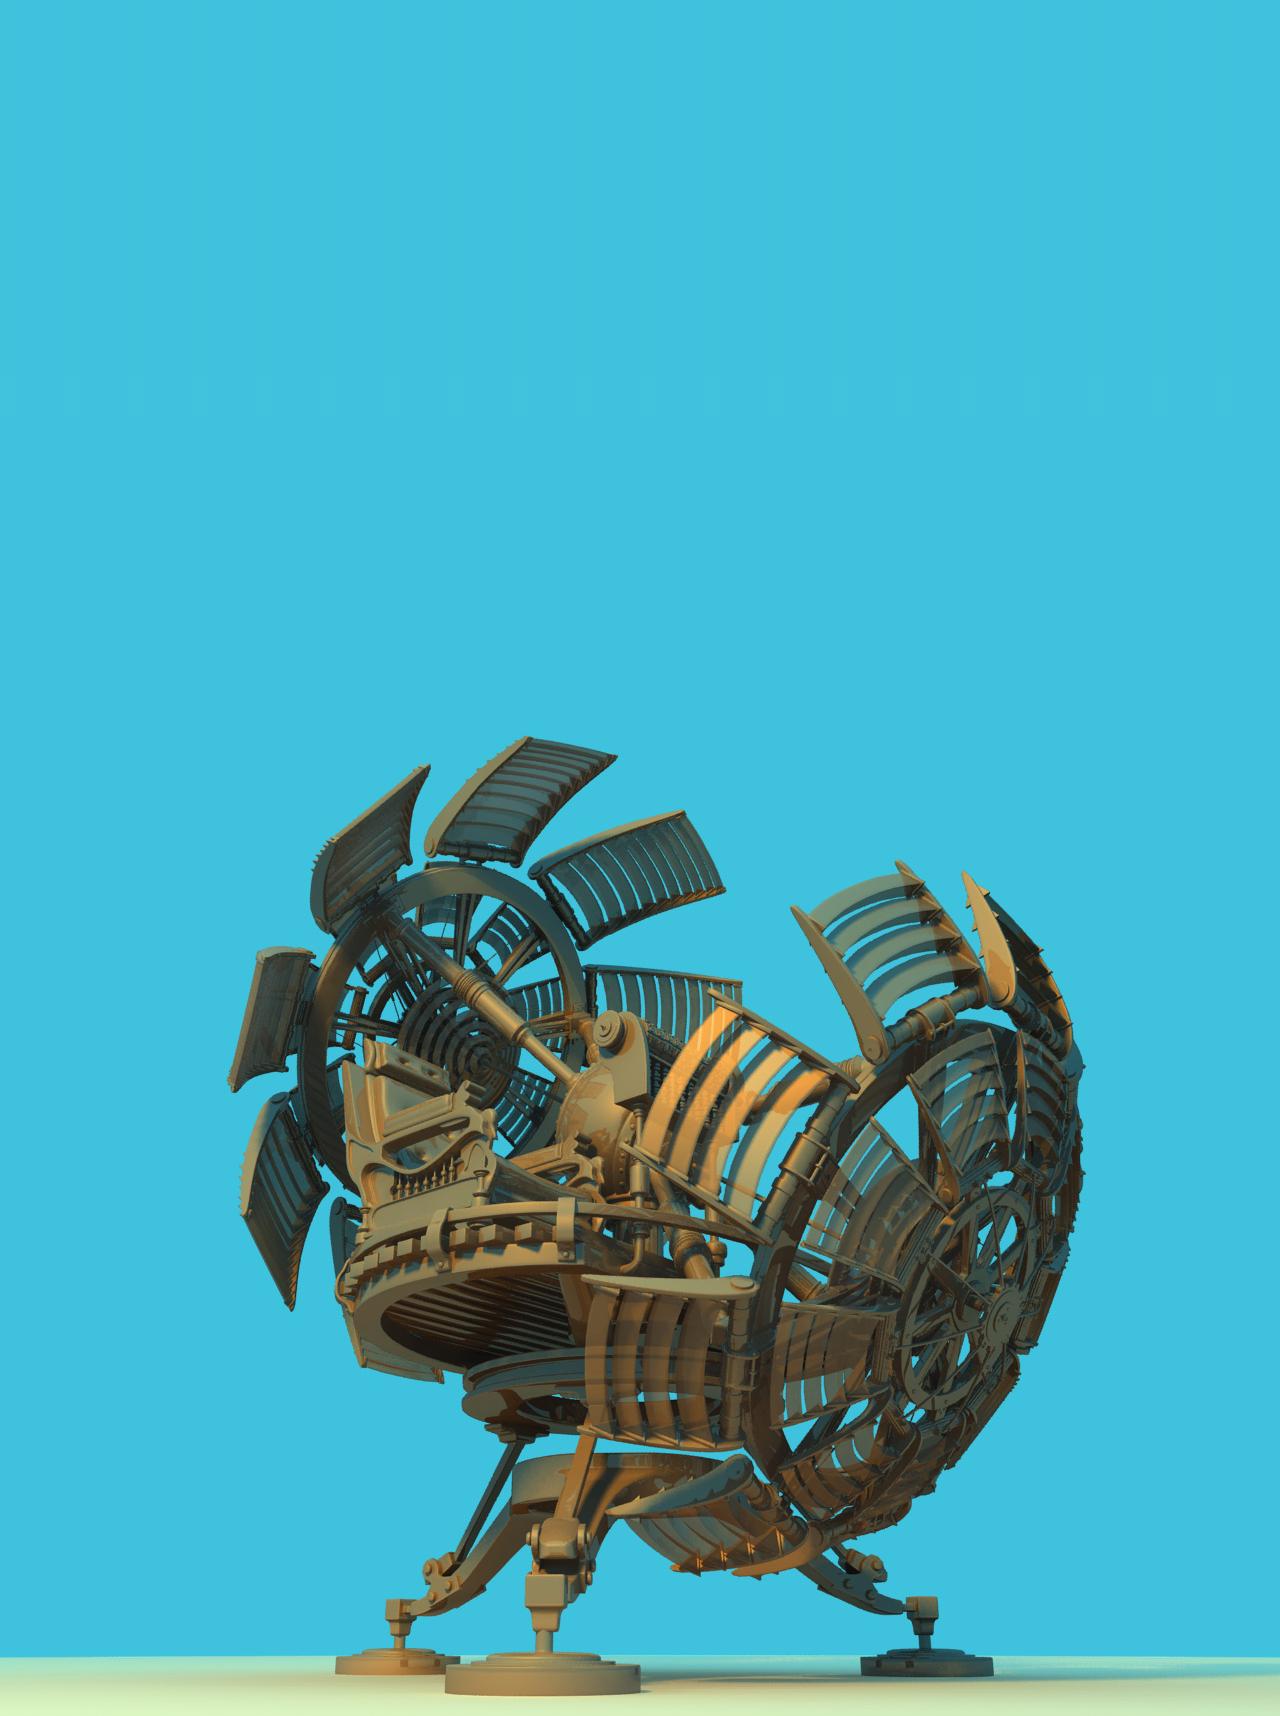 Time_Machine_Final_Render_04_by_Rivenchan.jpg